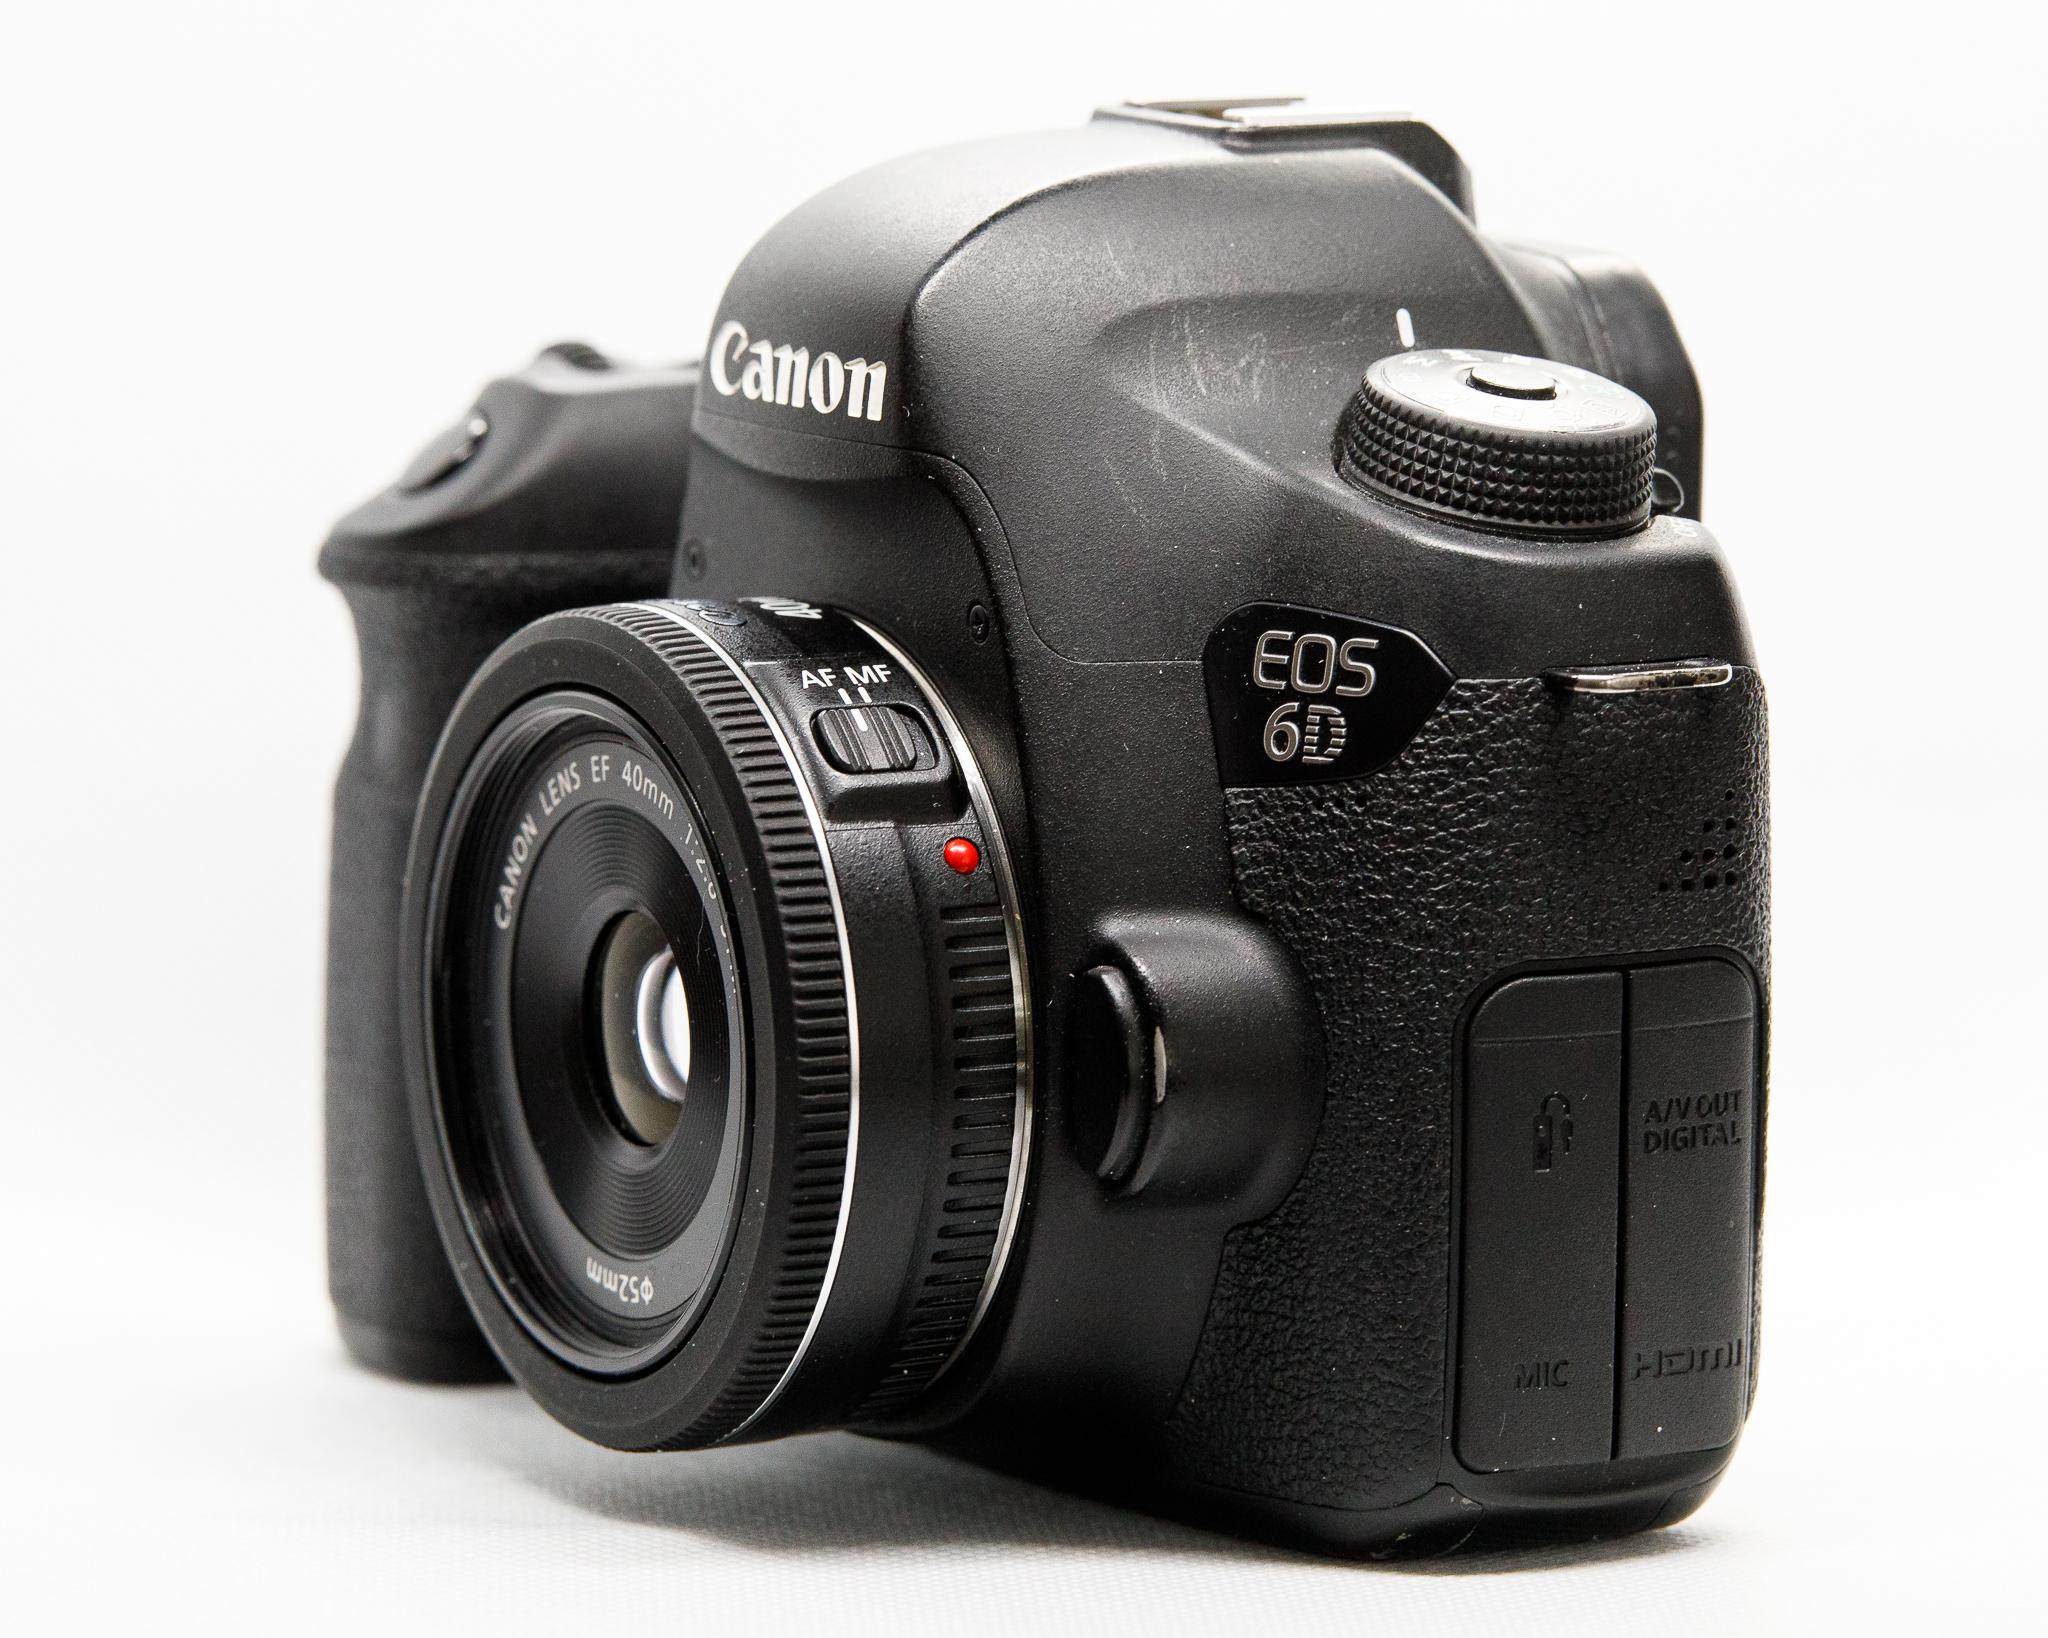 Wieninpannukakku - Canon EF 40mm f2.8 STM